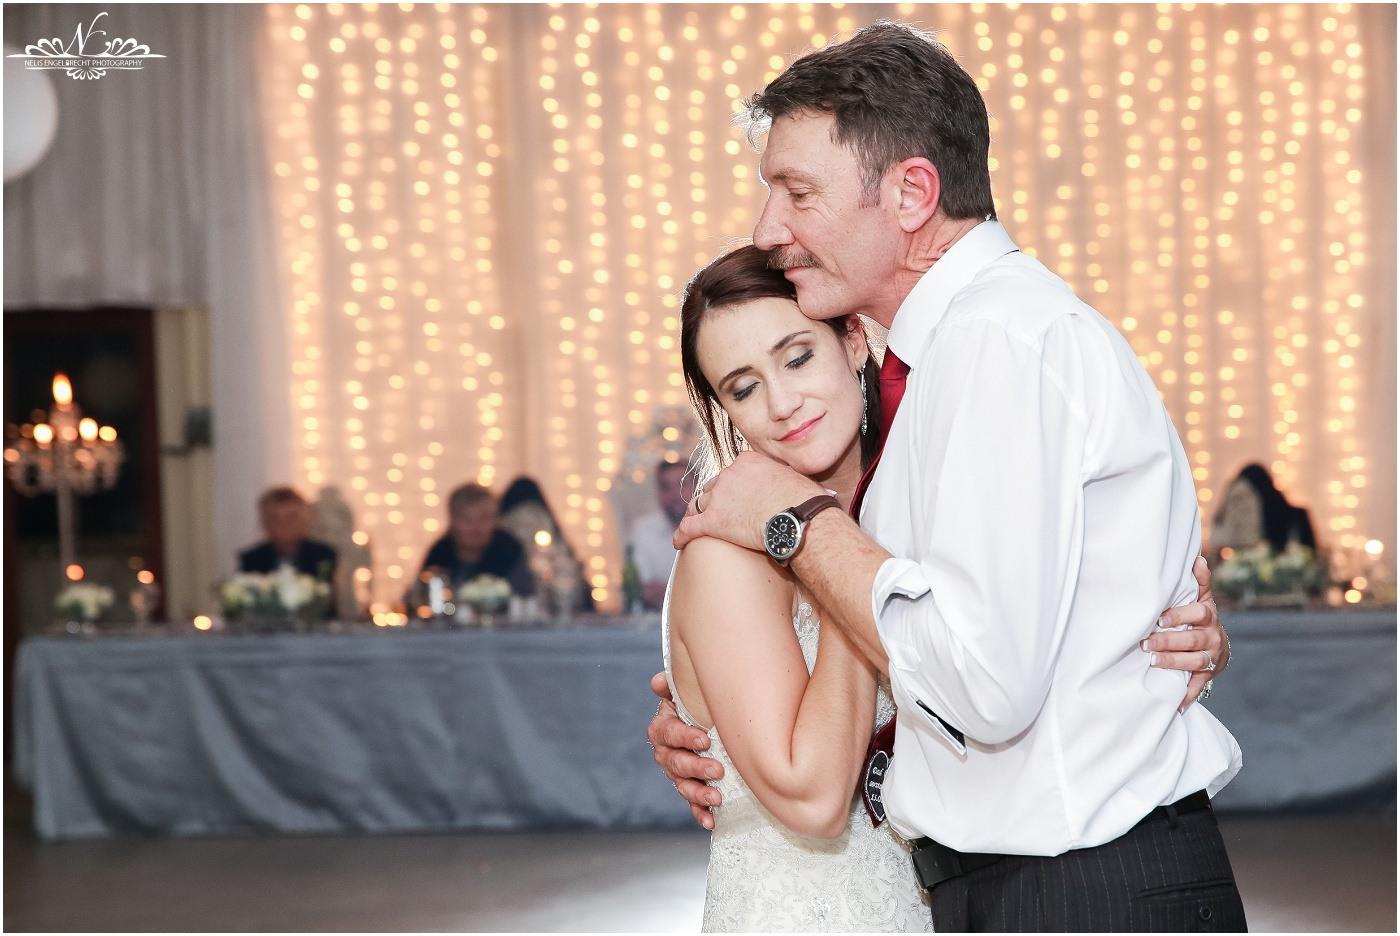 Eensgezind-Wedding-Photos-Nelis-Engelbrecht-Photography-218